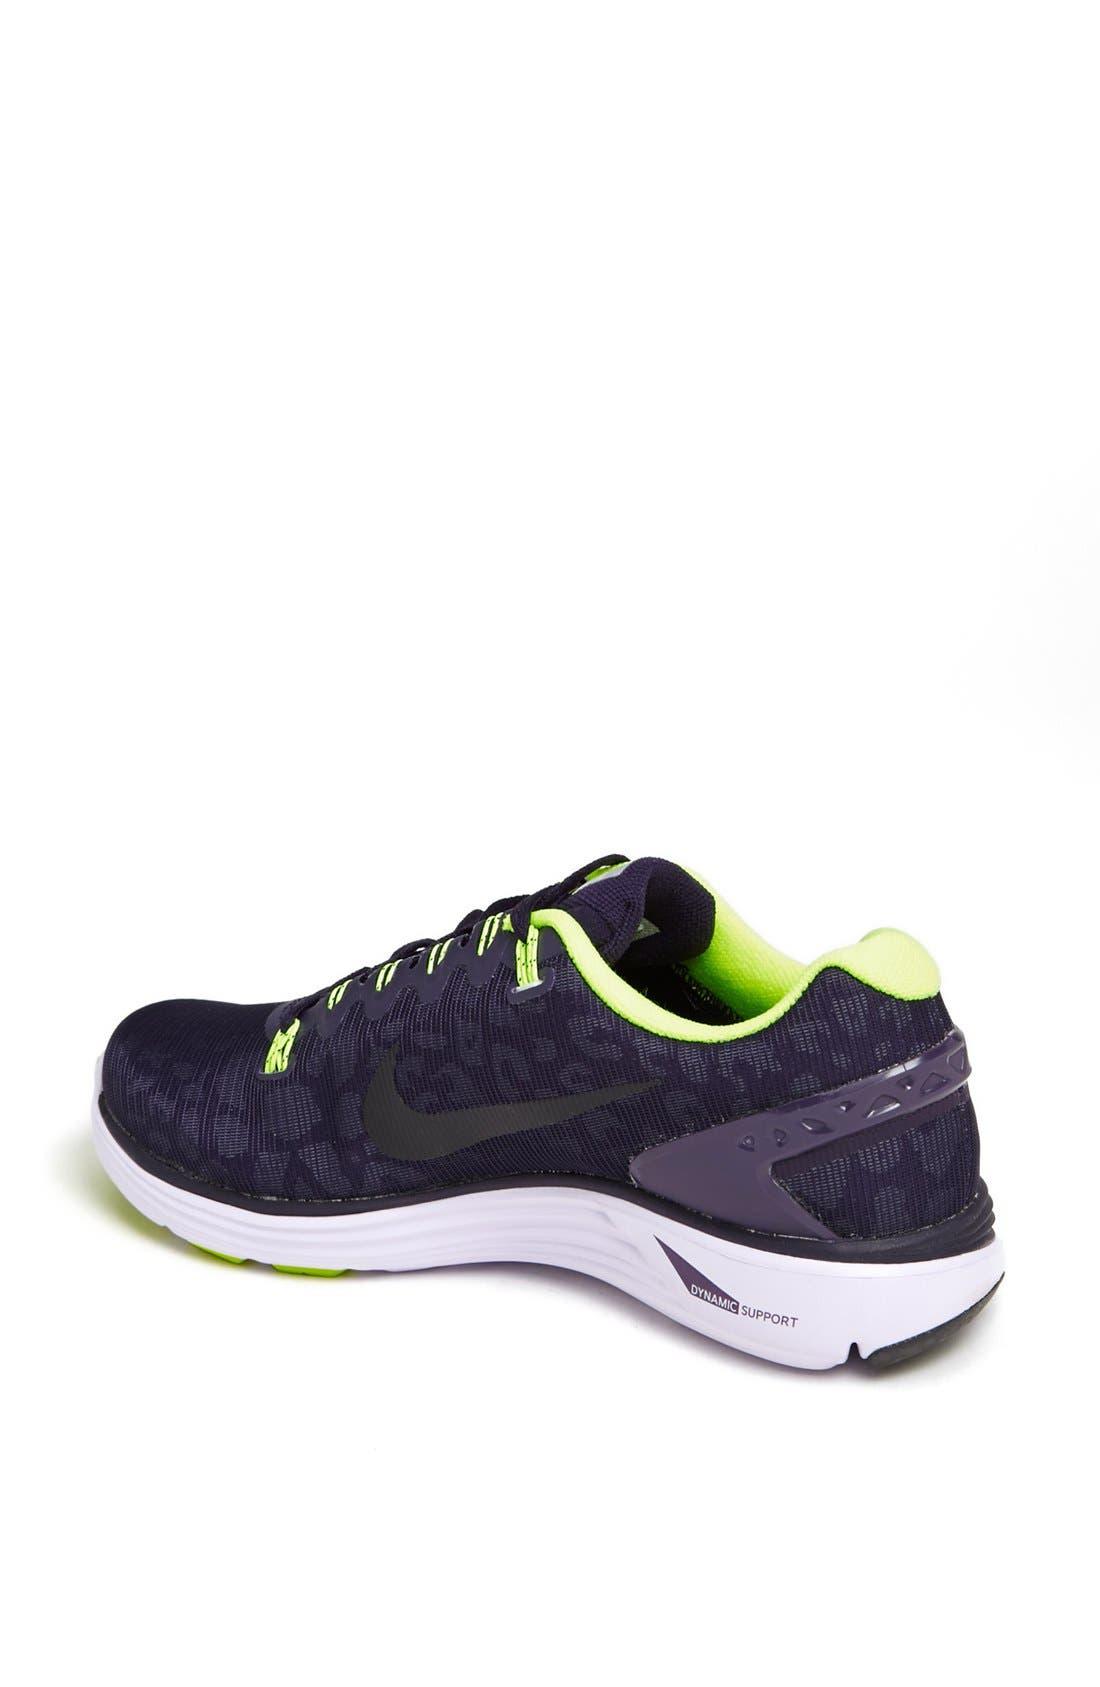 Alternate Image 2  - Nike 'LunarGlide+ 5 Shield' Water Resistant Running Shoe